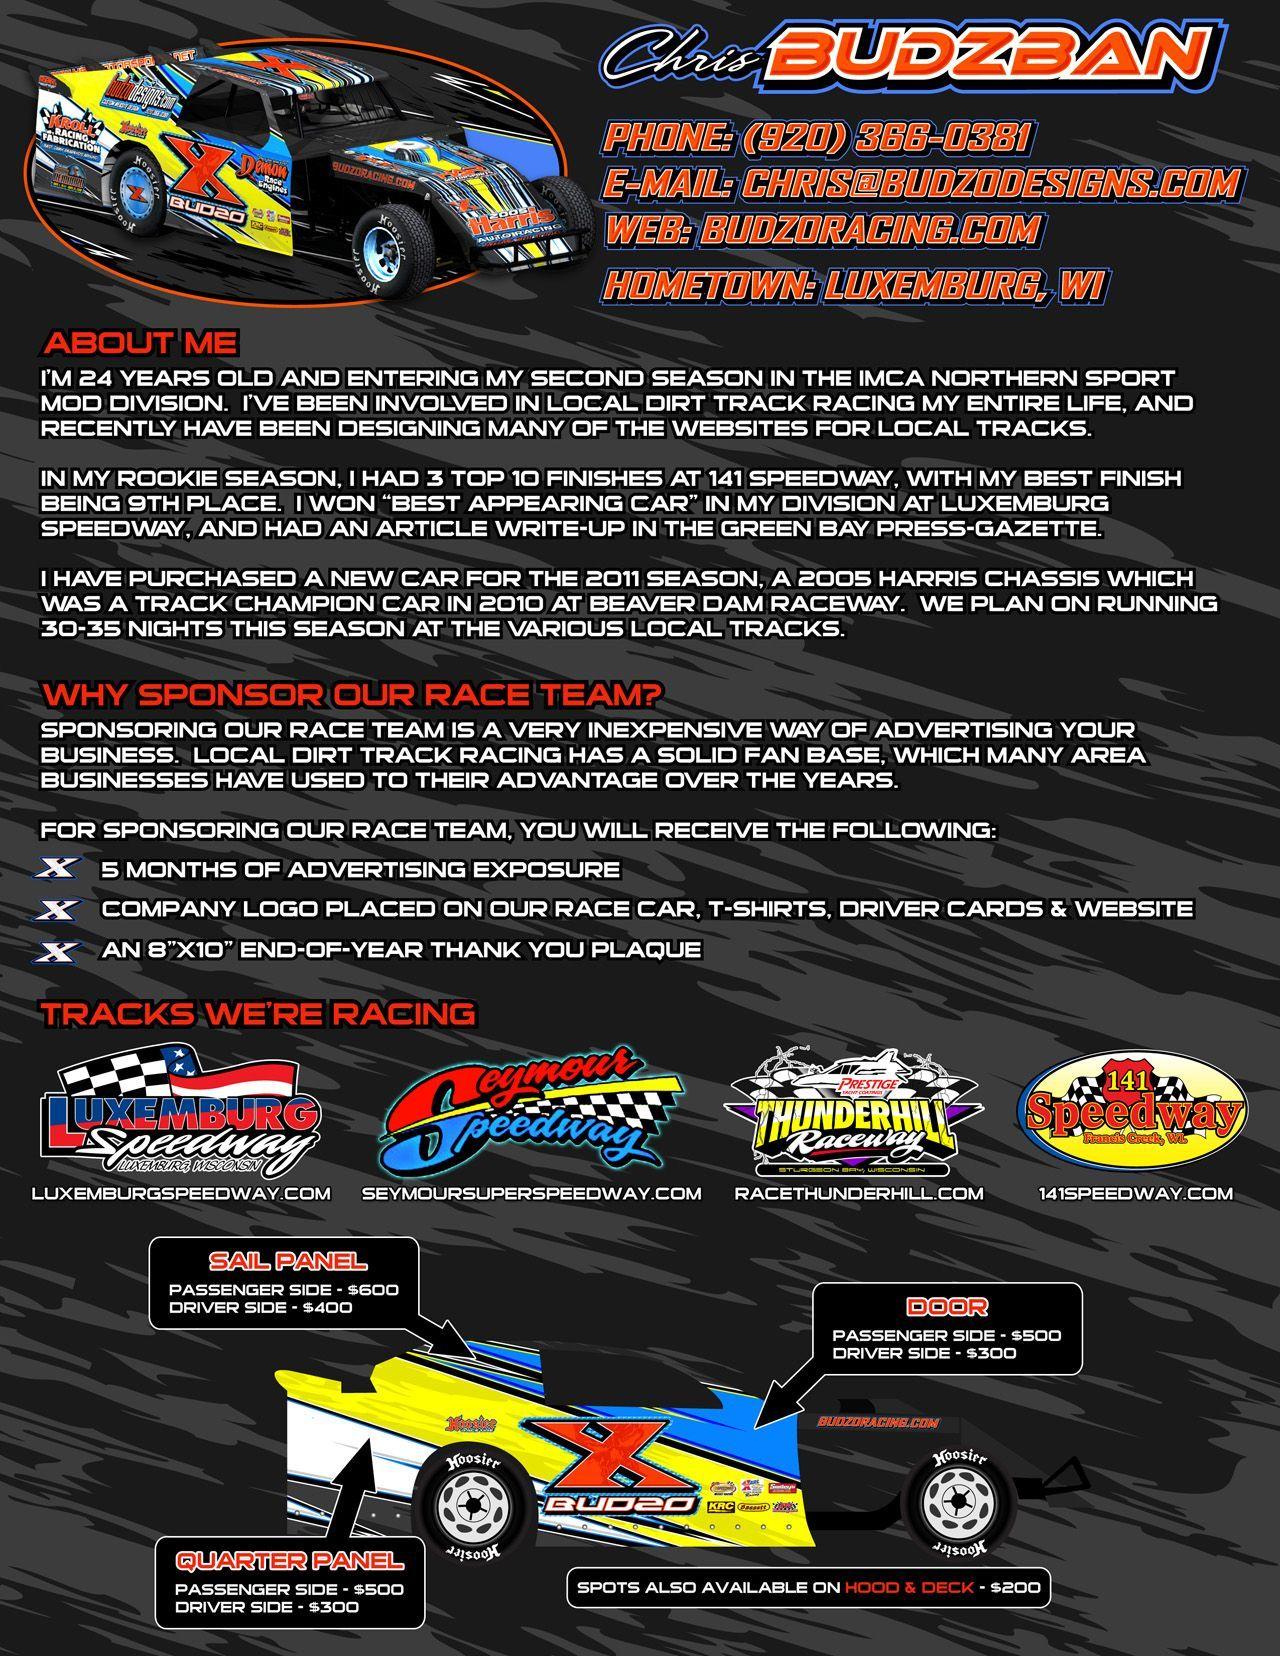 Race Car Sponsorship Template It Resume Cover Racing Sponsorship Search Sponsorship Proposal Racing Sponsorship Letter